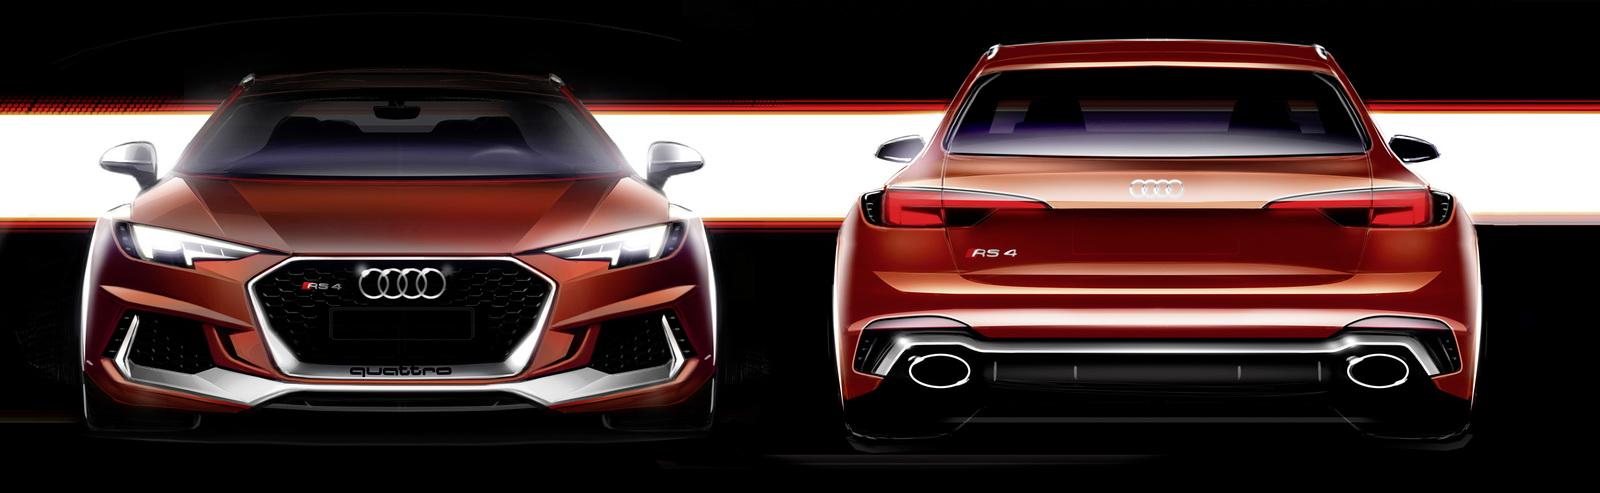 Audi RS4 Avant MY 2018